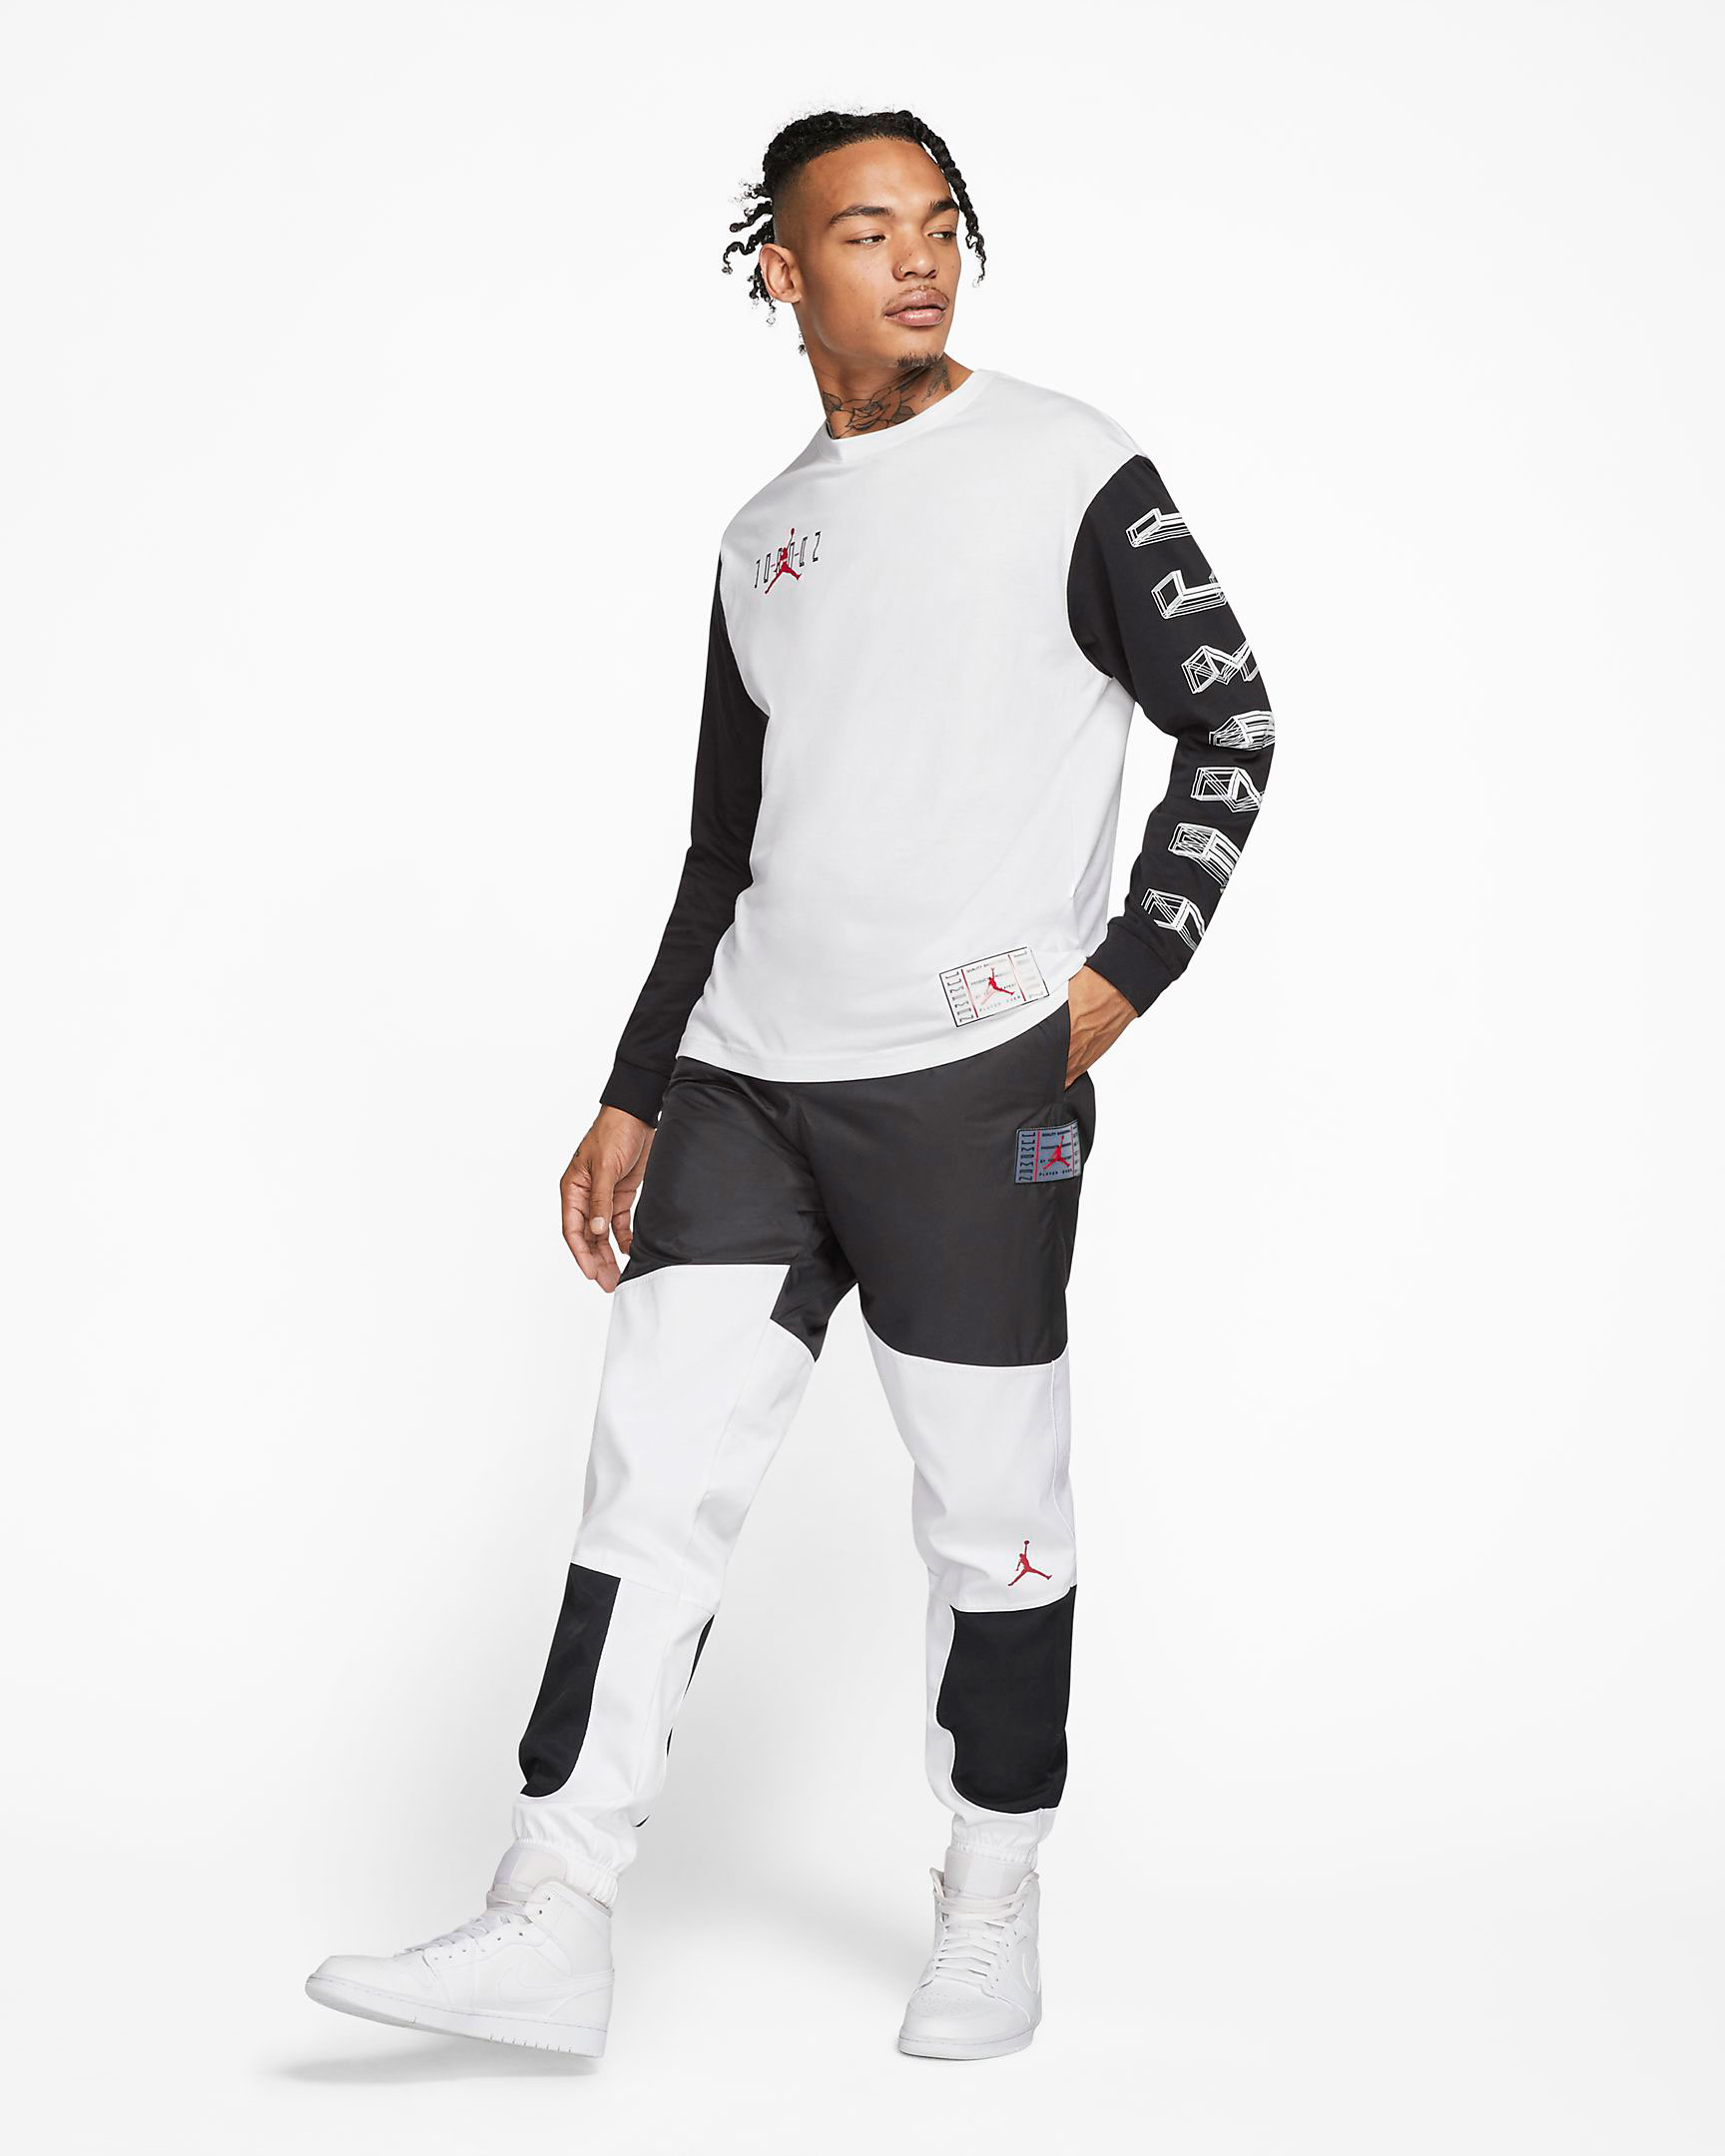 jordan-11-bred-shirt-pants